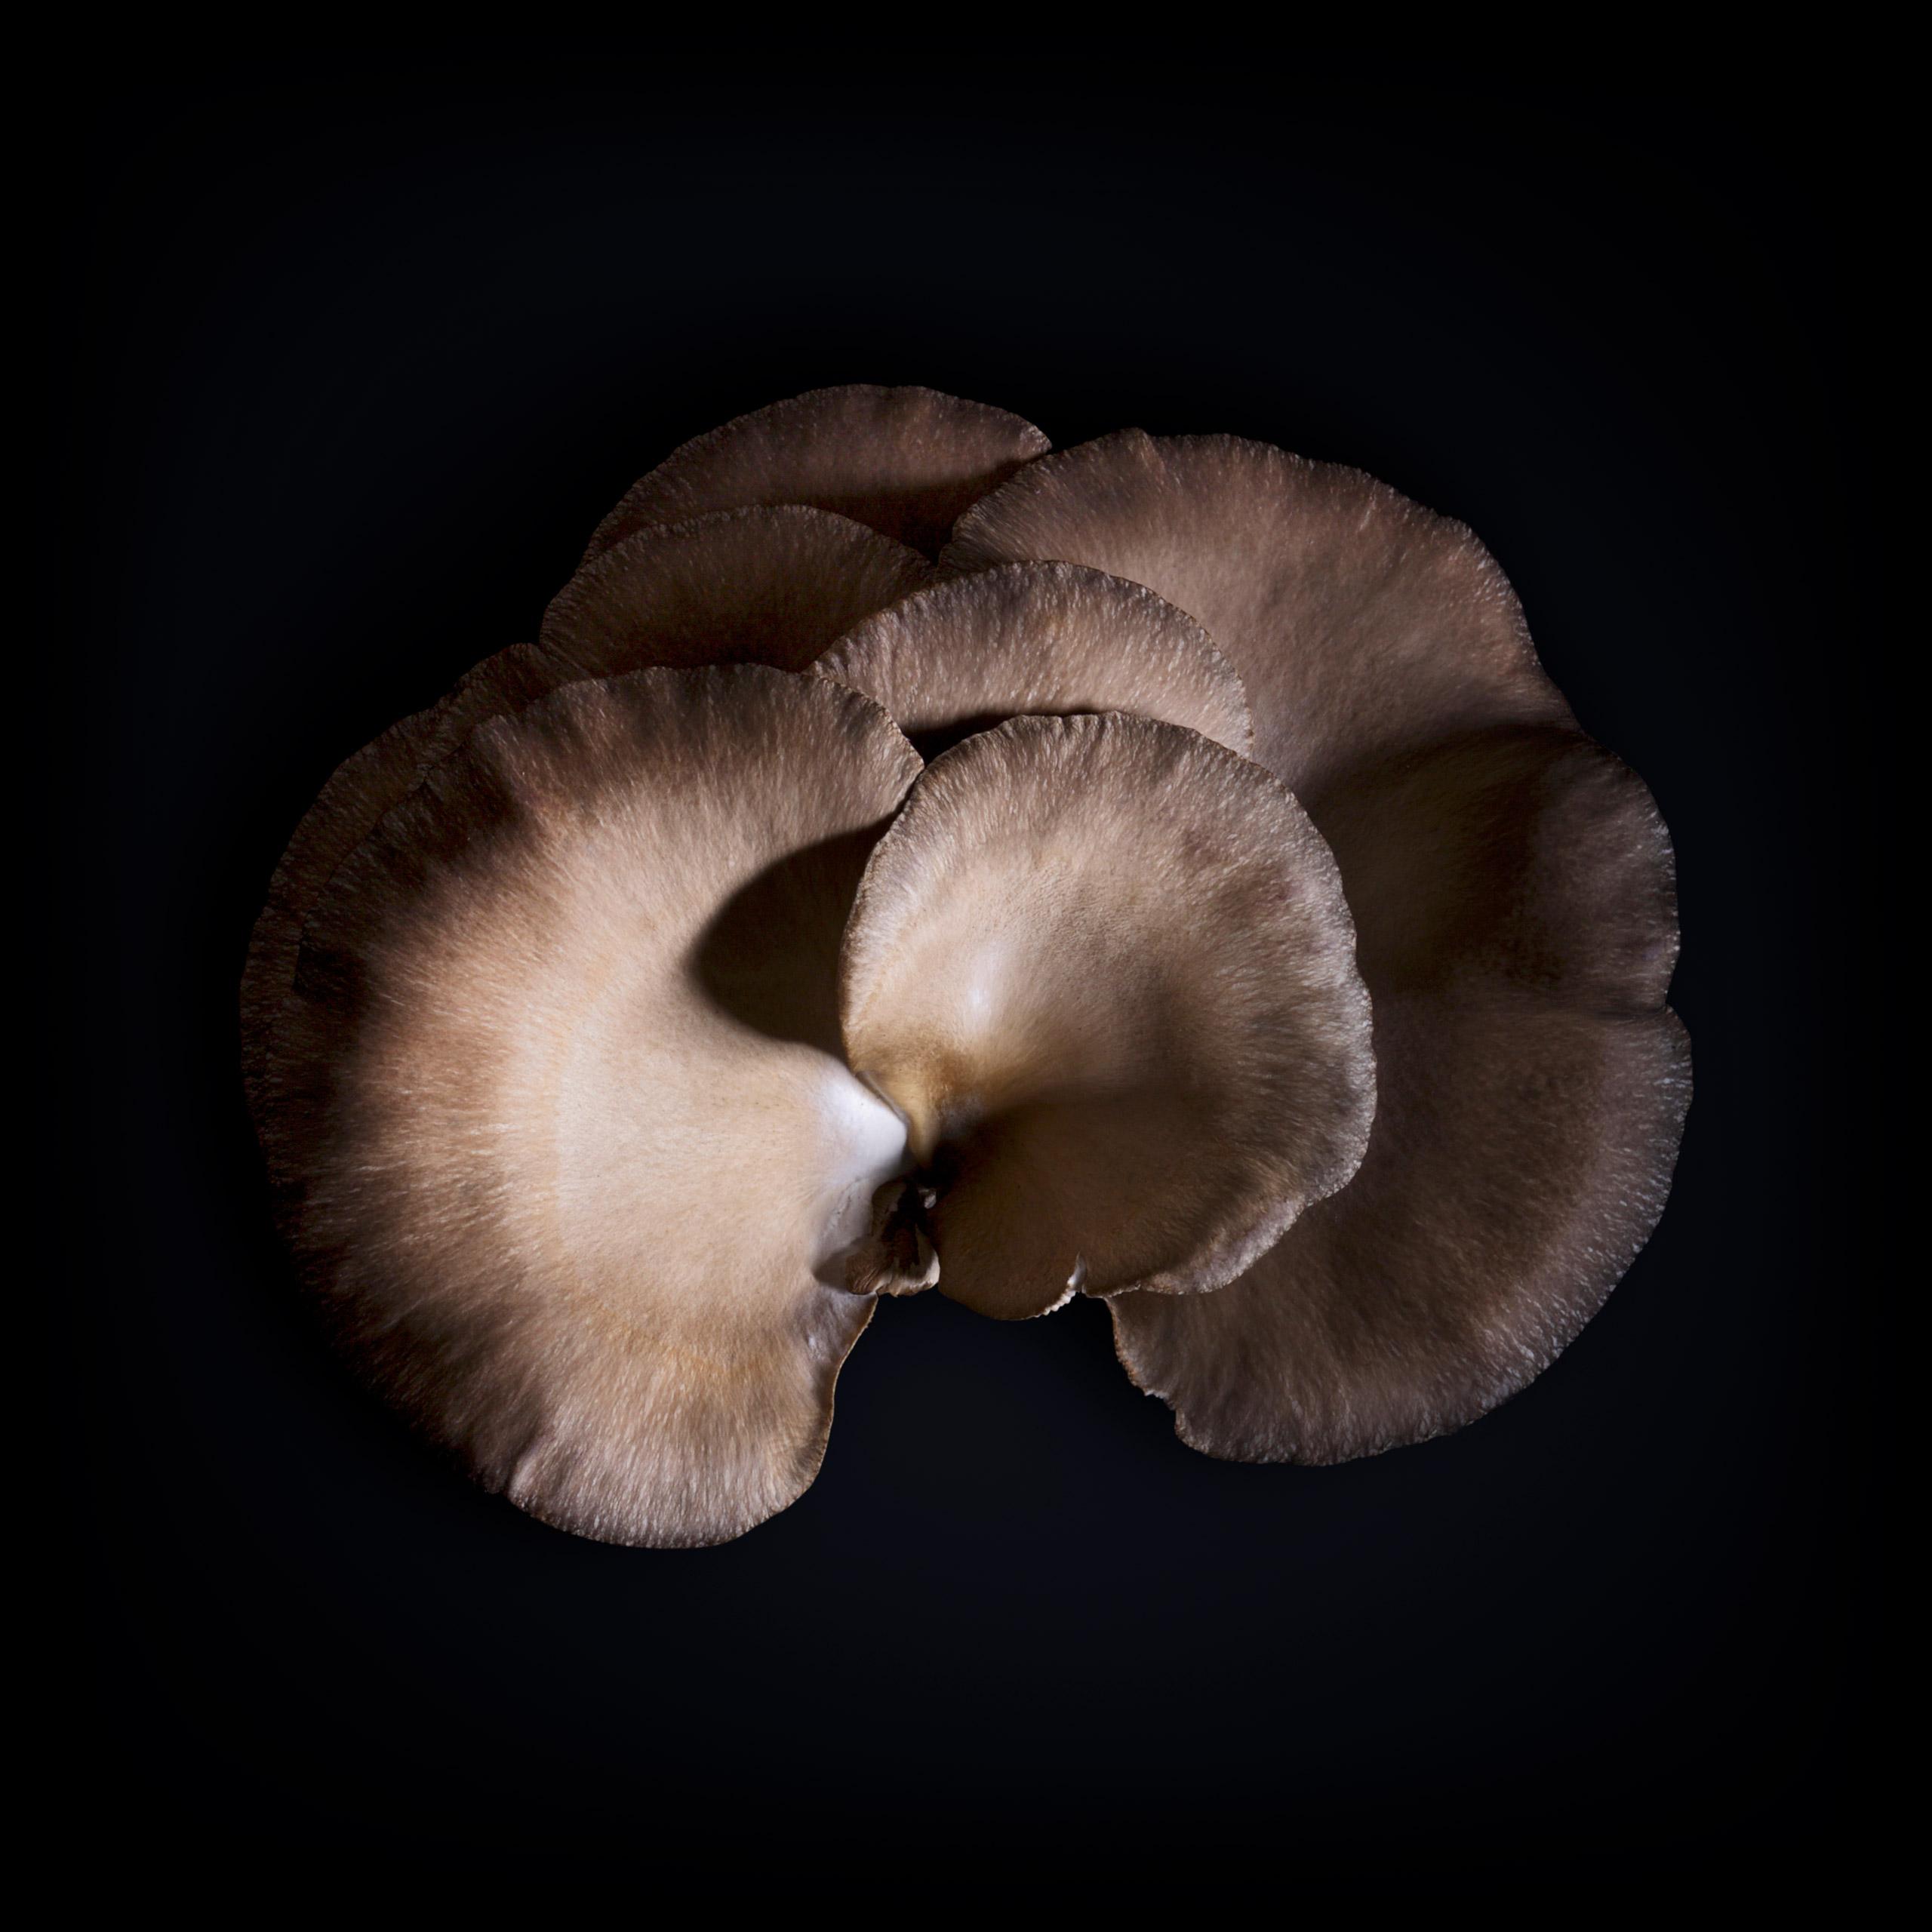 benton-rise-farm-mushroom-06